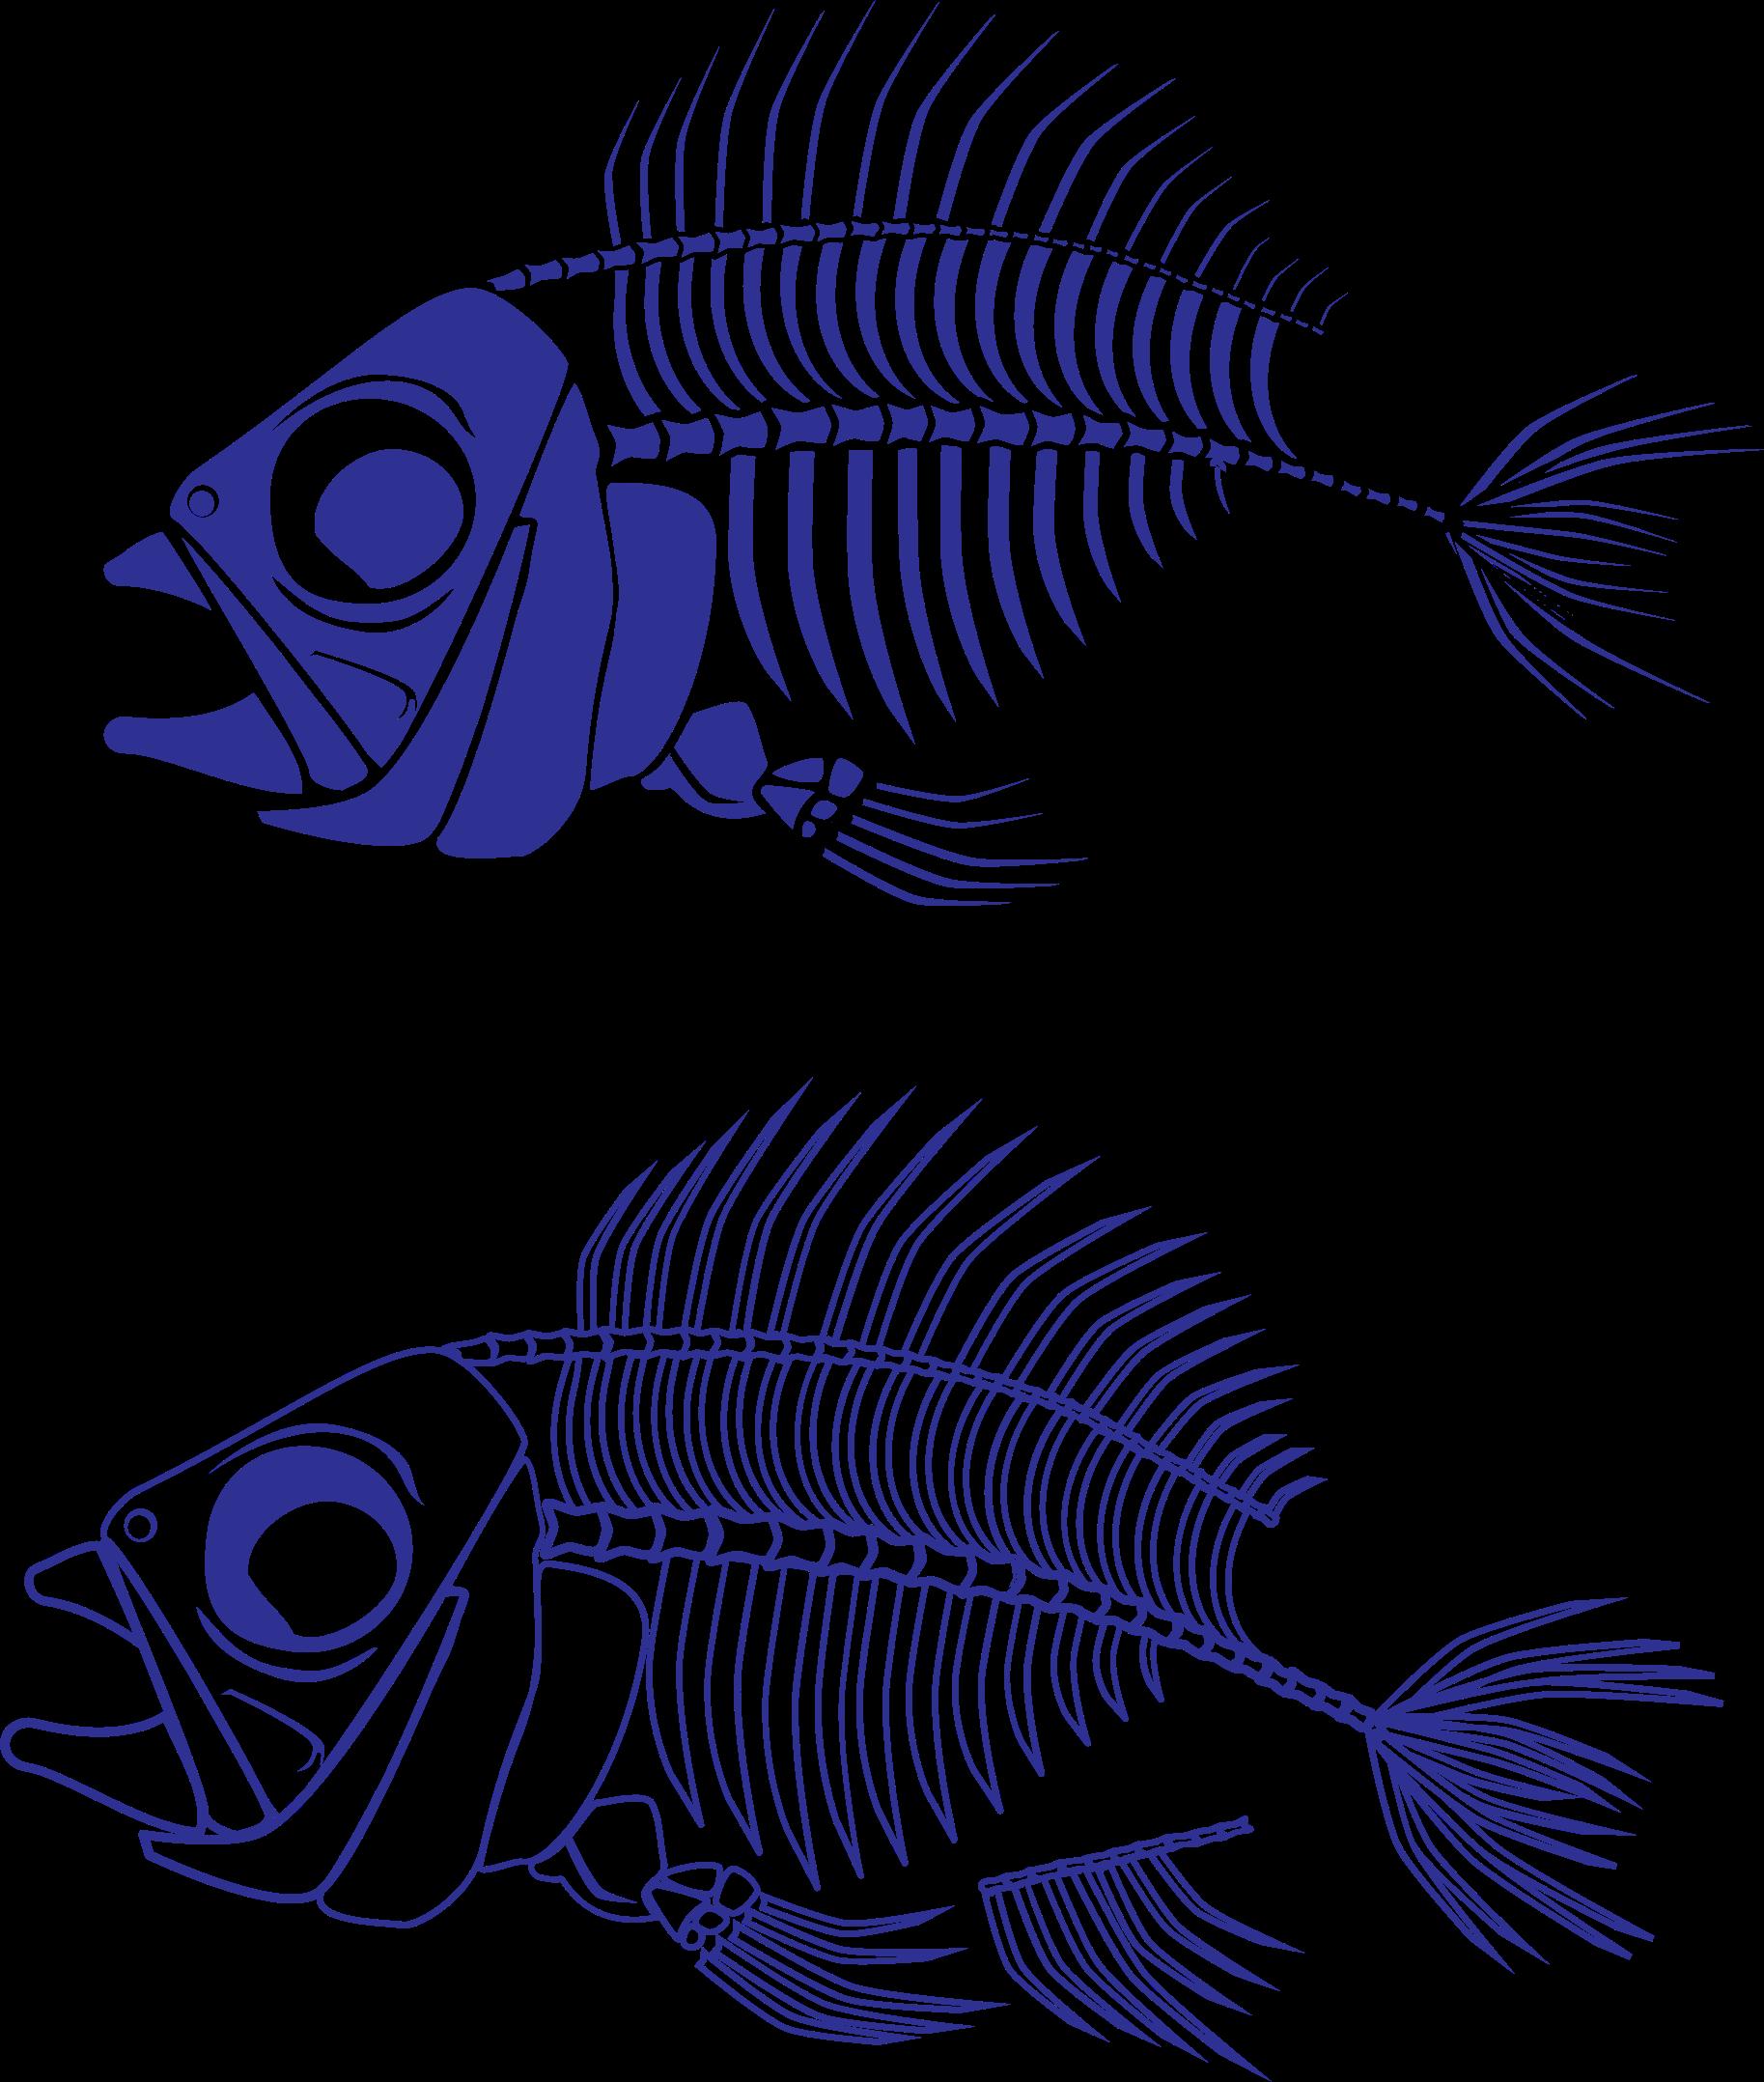 Fish skeleton clipart clip art black and white download Clipart - Fish Skeleton clip art black and white download